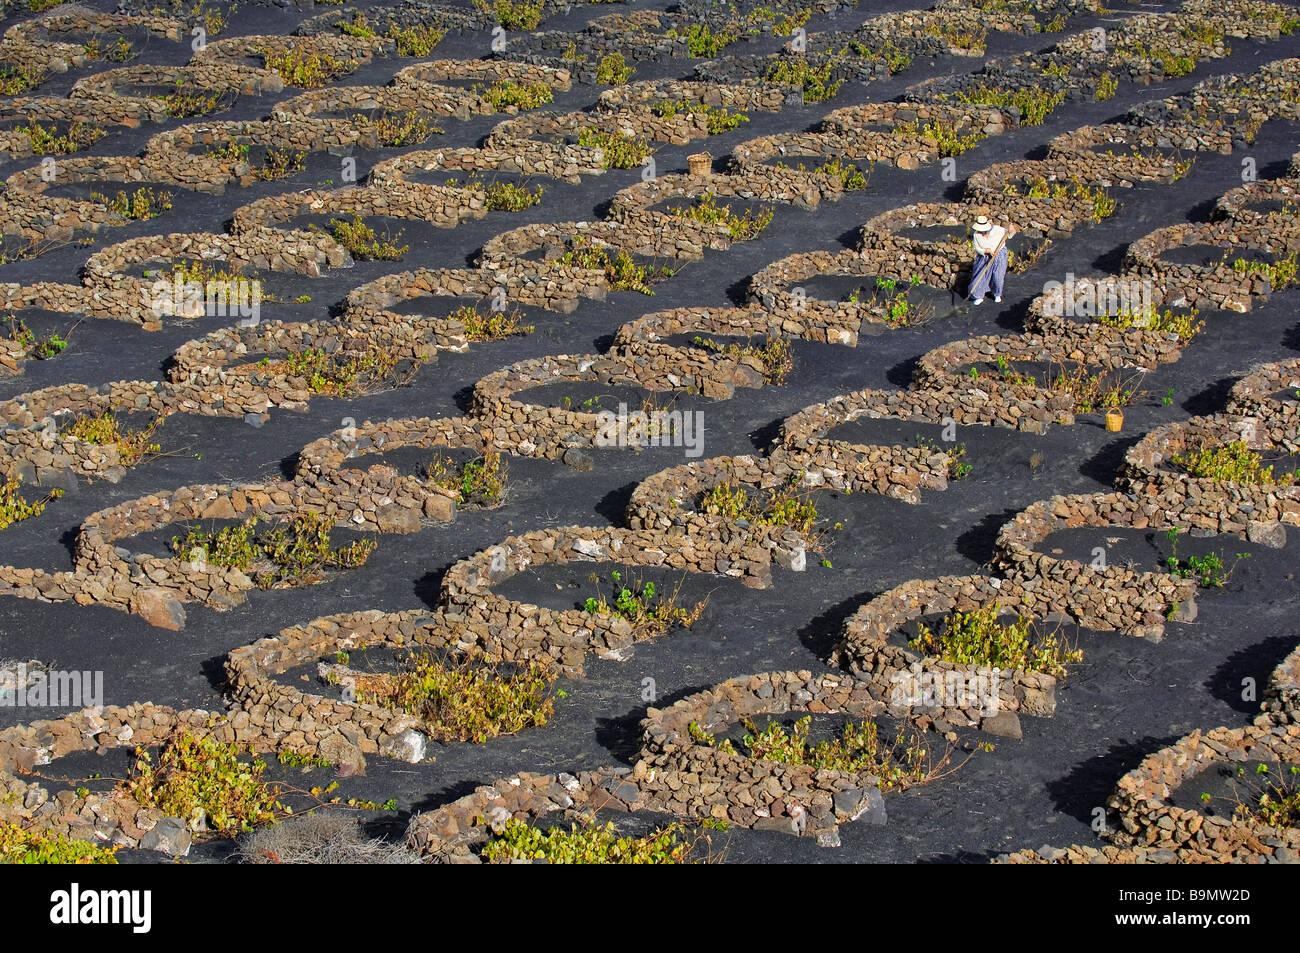 Spain, Canary Islands, Lanzarote Island, Biosphere reserve, Biosphere reserve, La Geria, peasant working in the - Stock Image